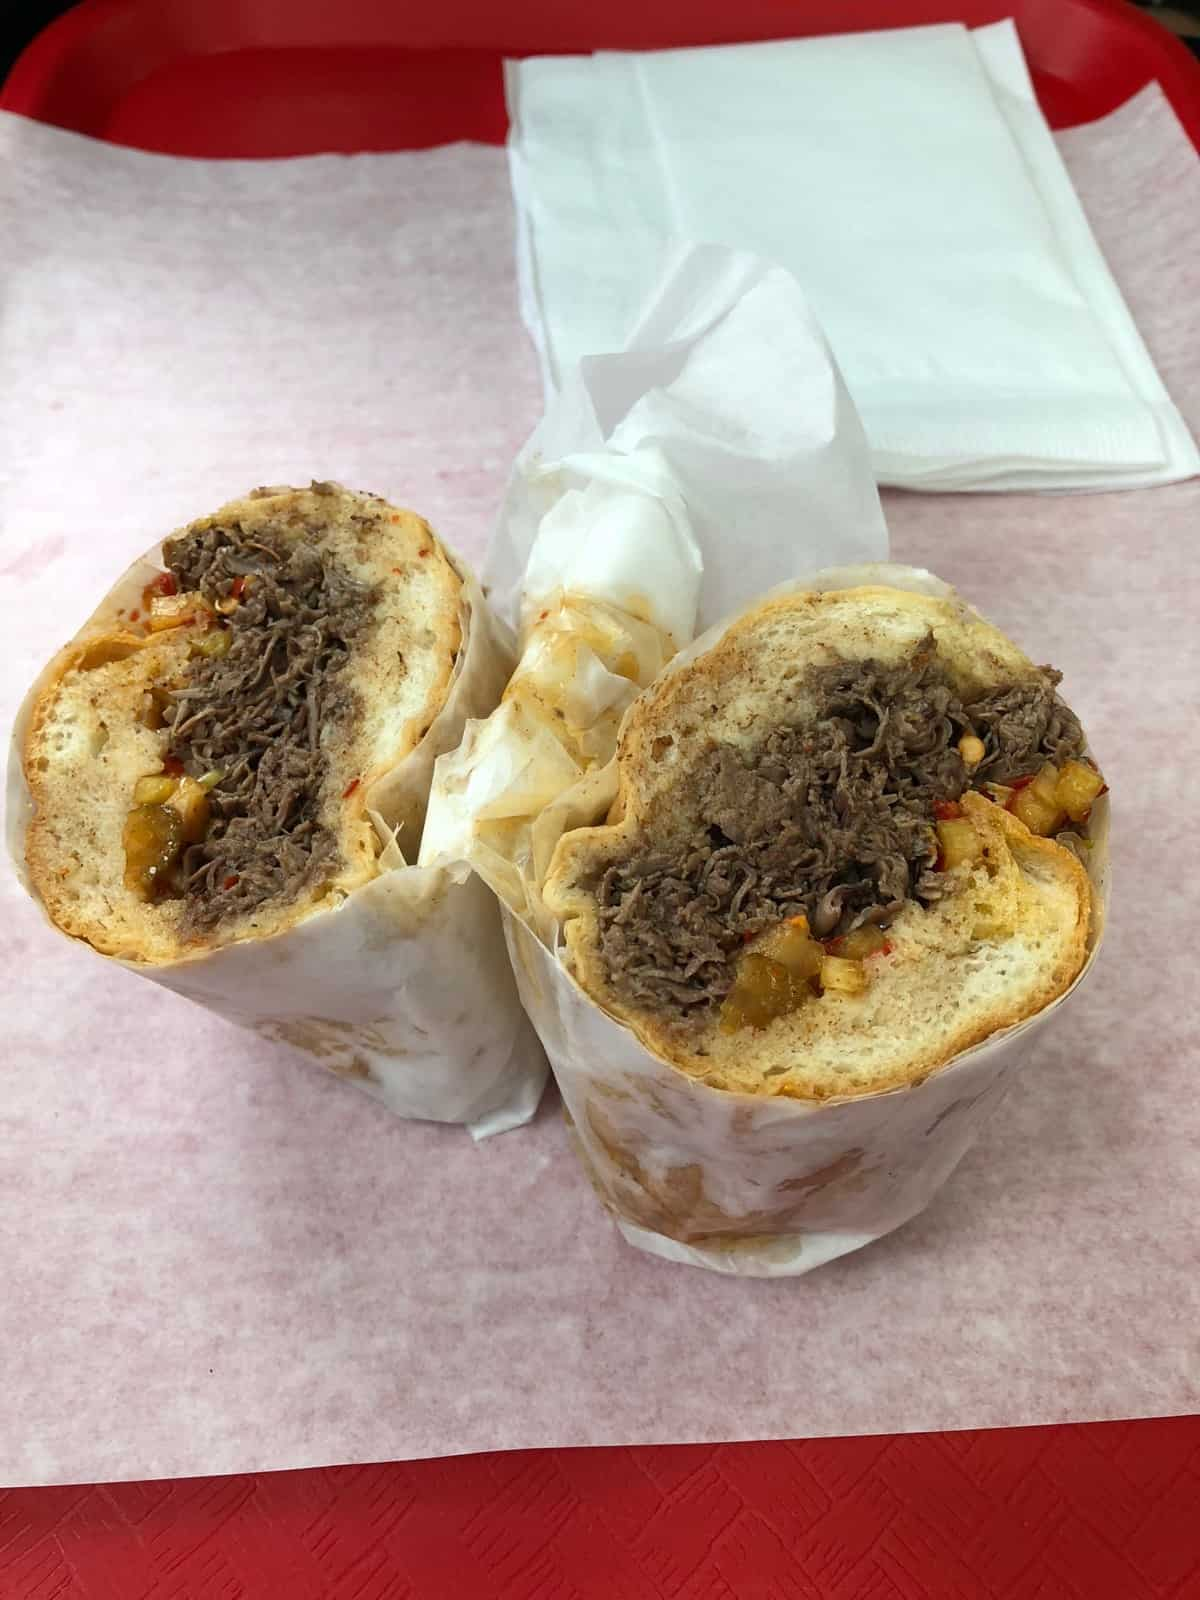 Italian beef sandwich from Al's Beef in Chicago, IL